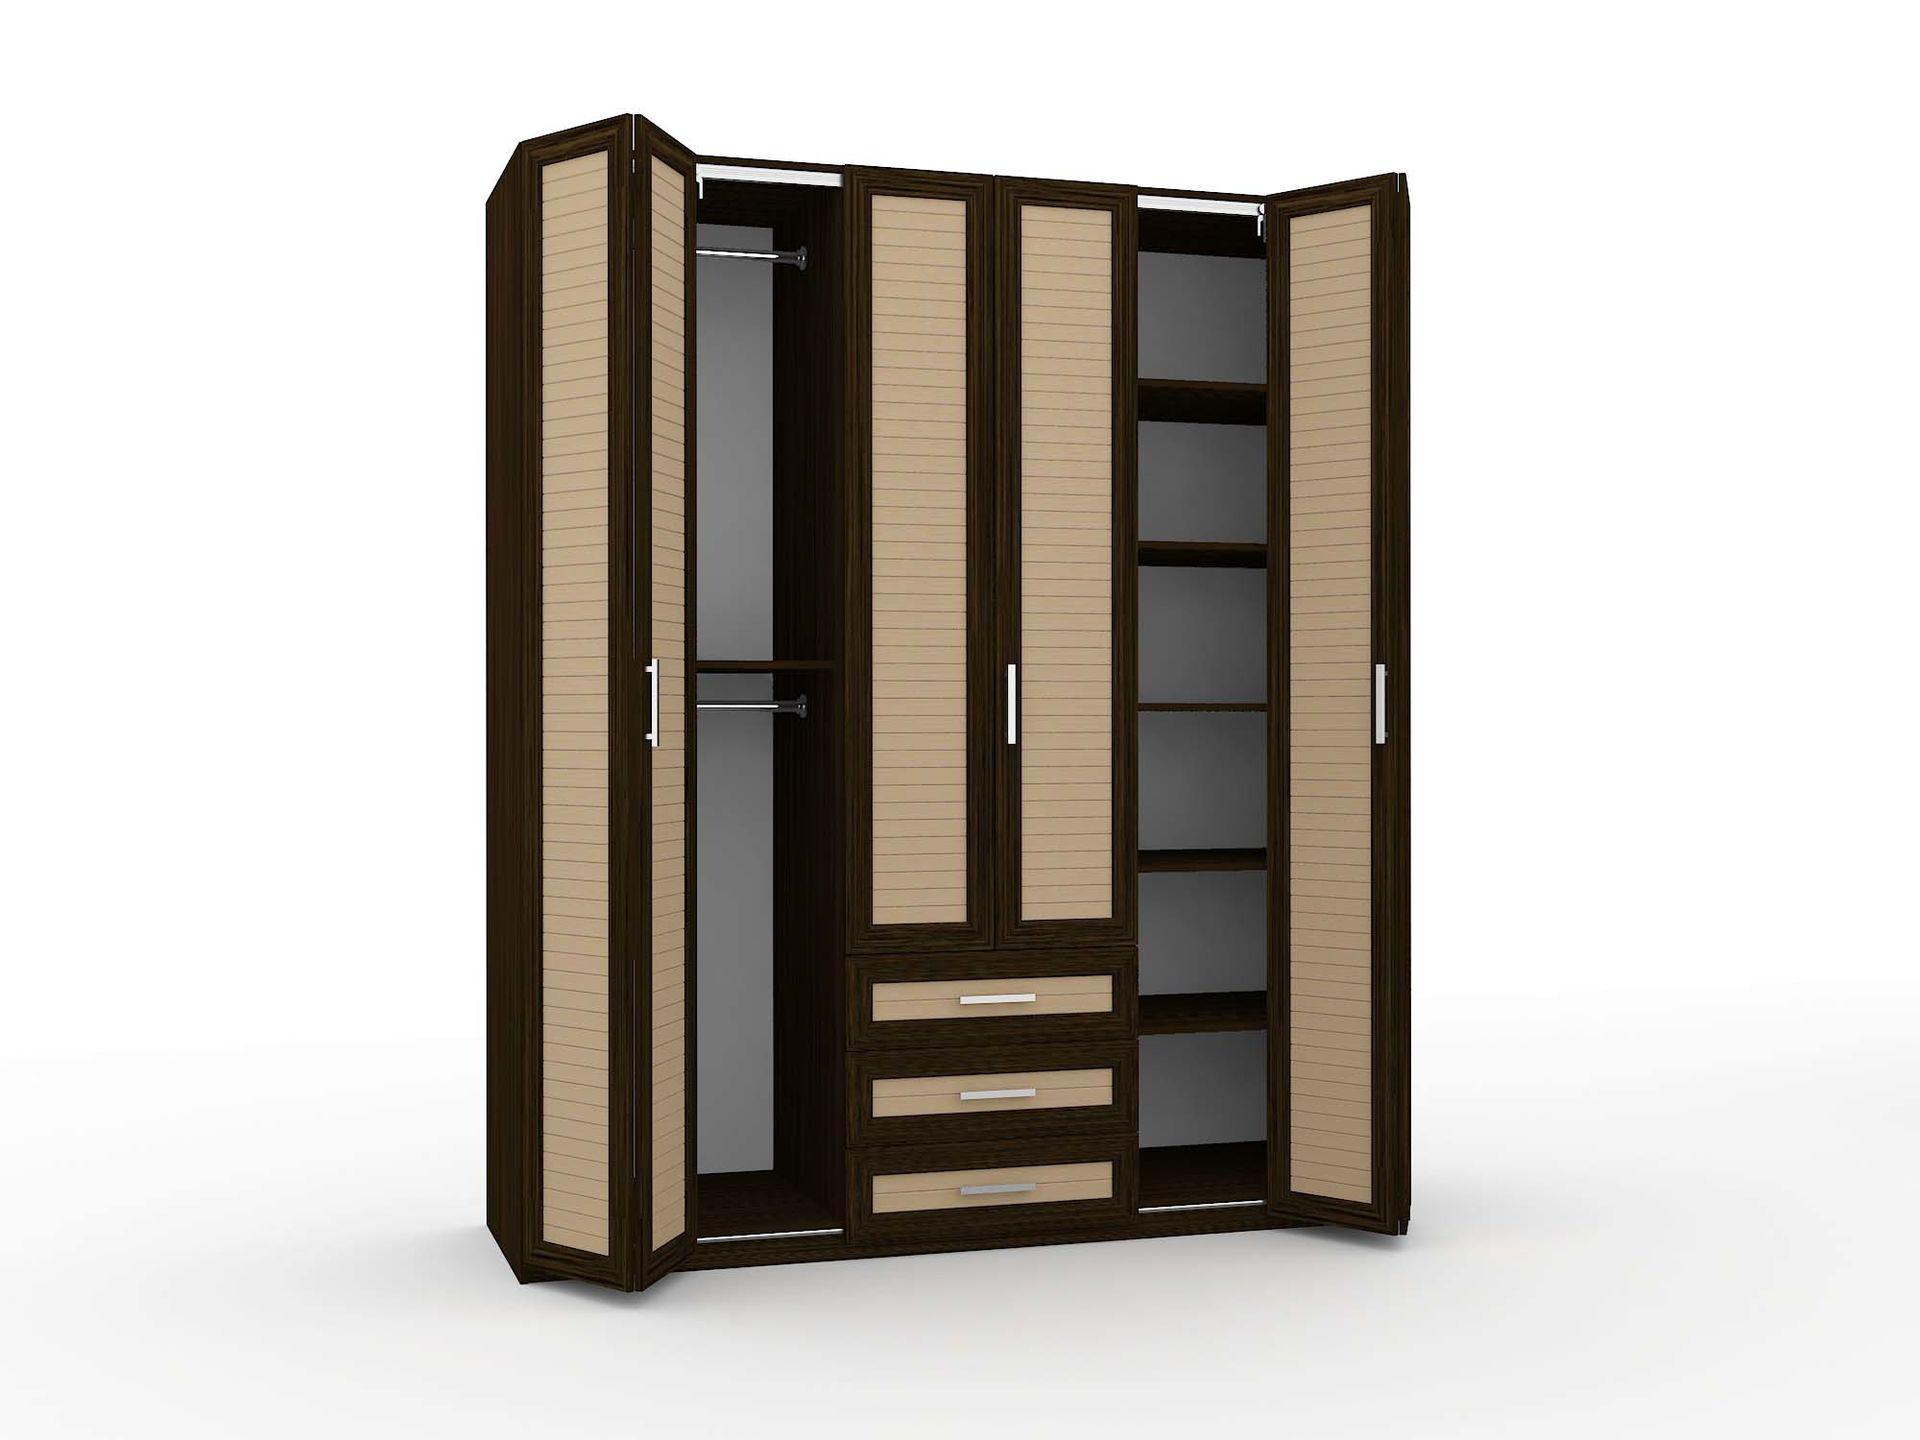 Шкаф-гармошка с плит МДФ